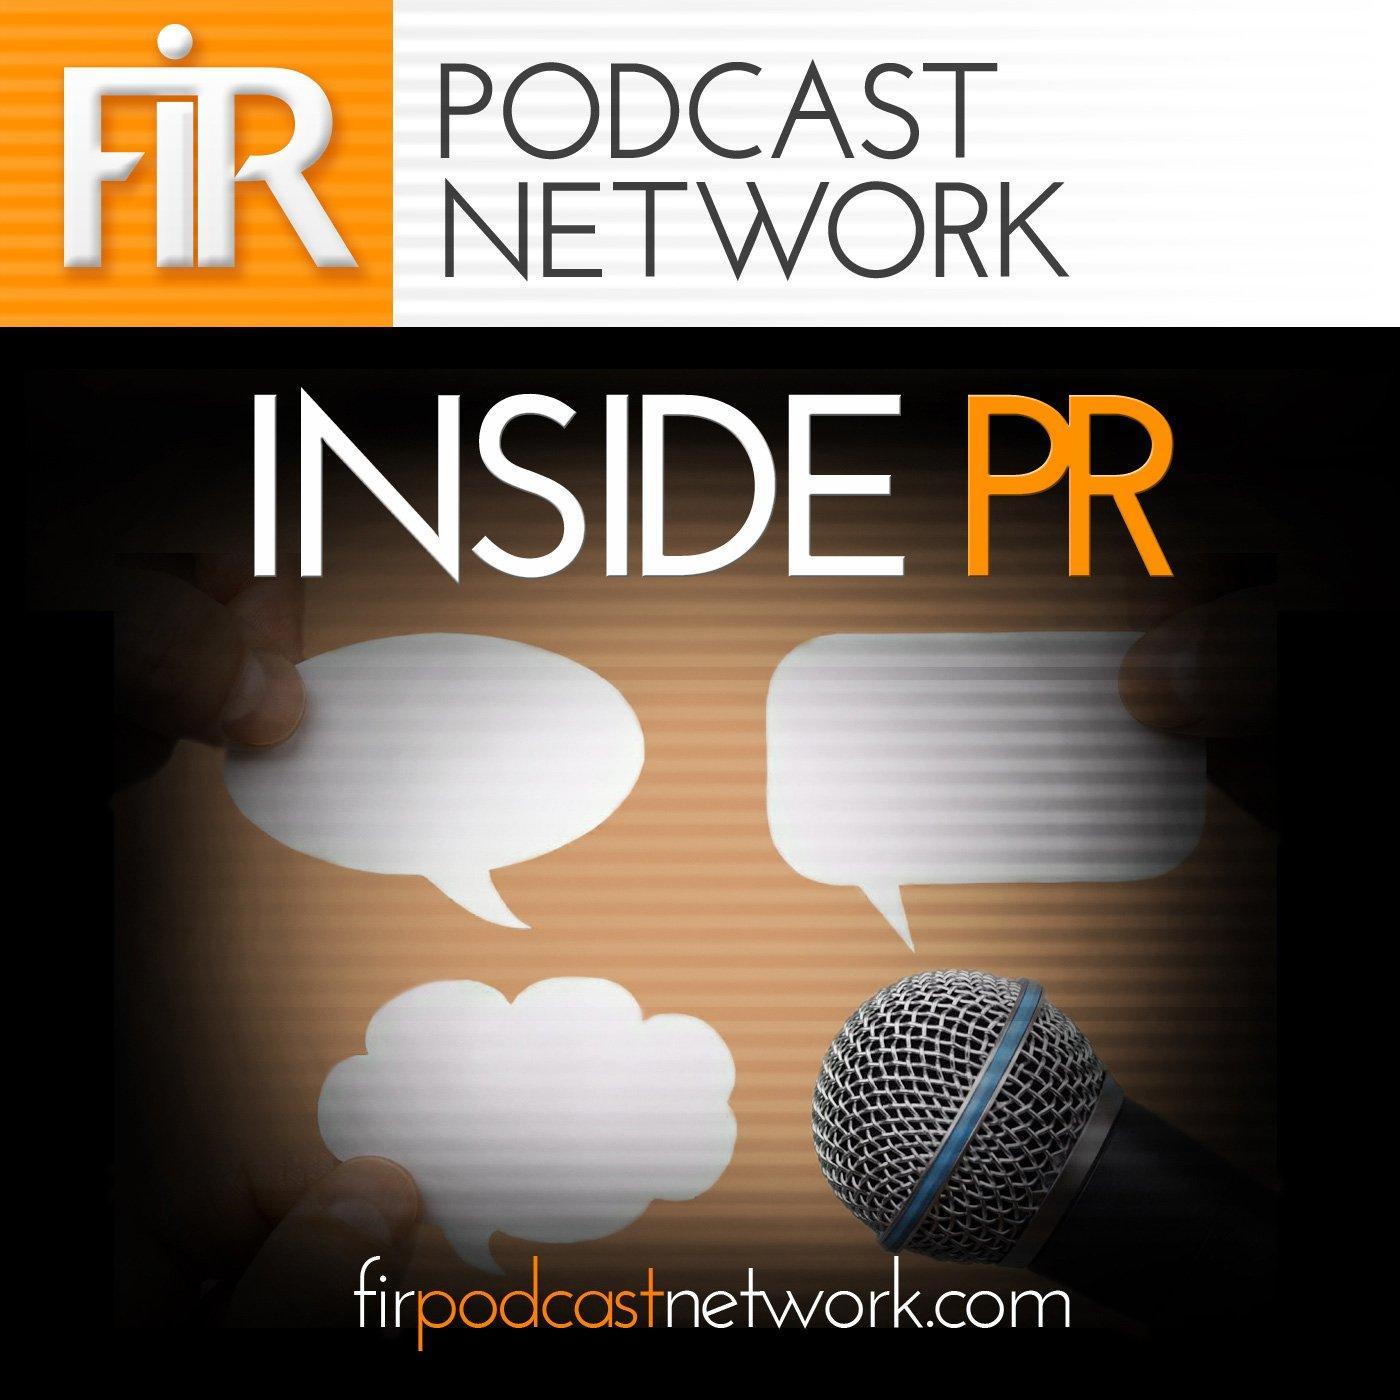 Inside PR 466: Email responsibly.